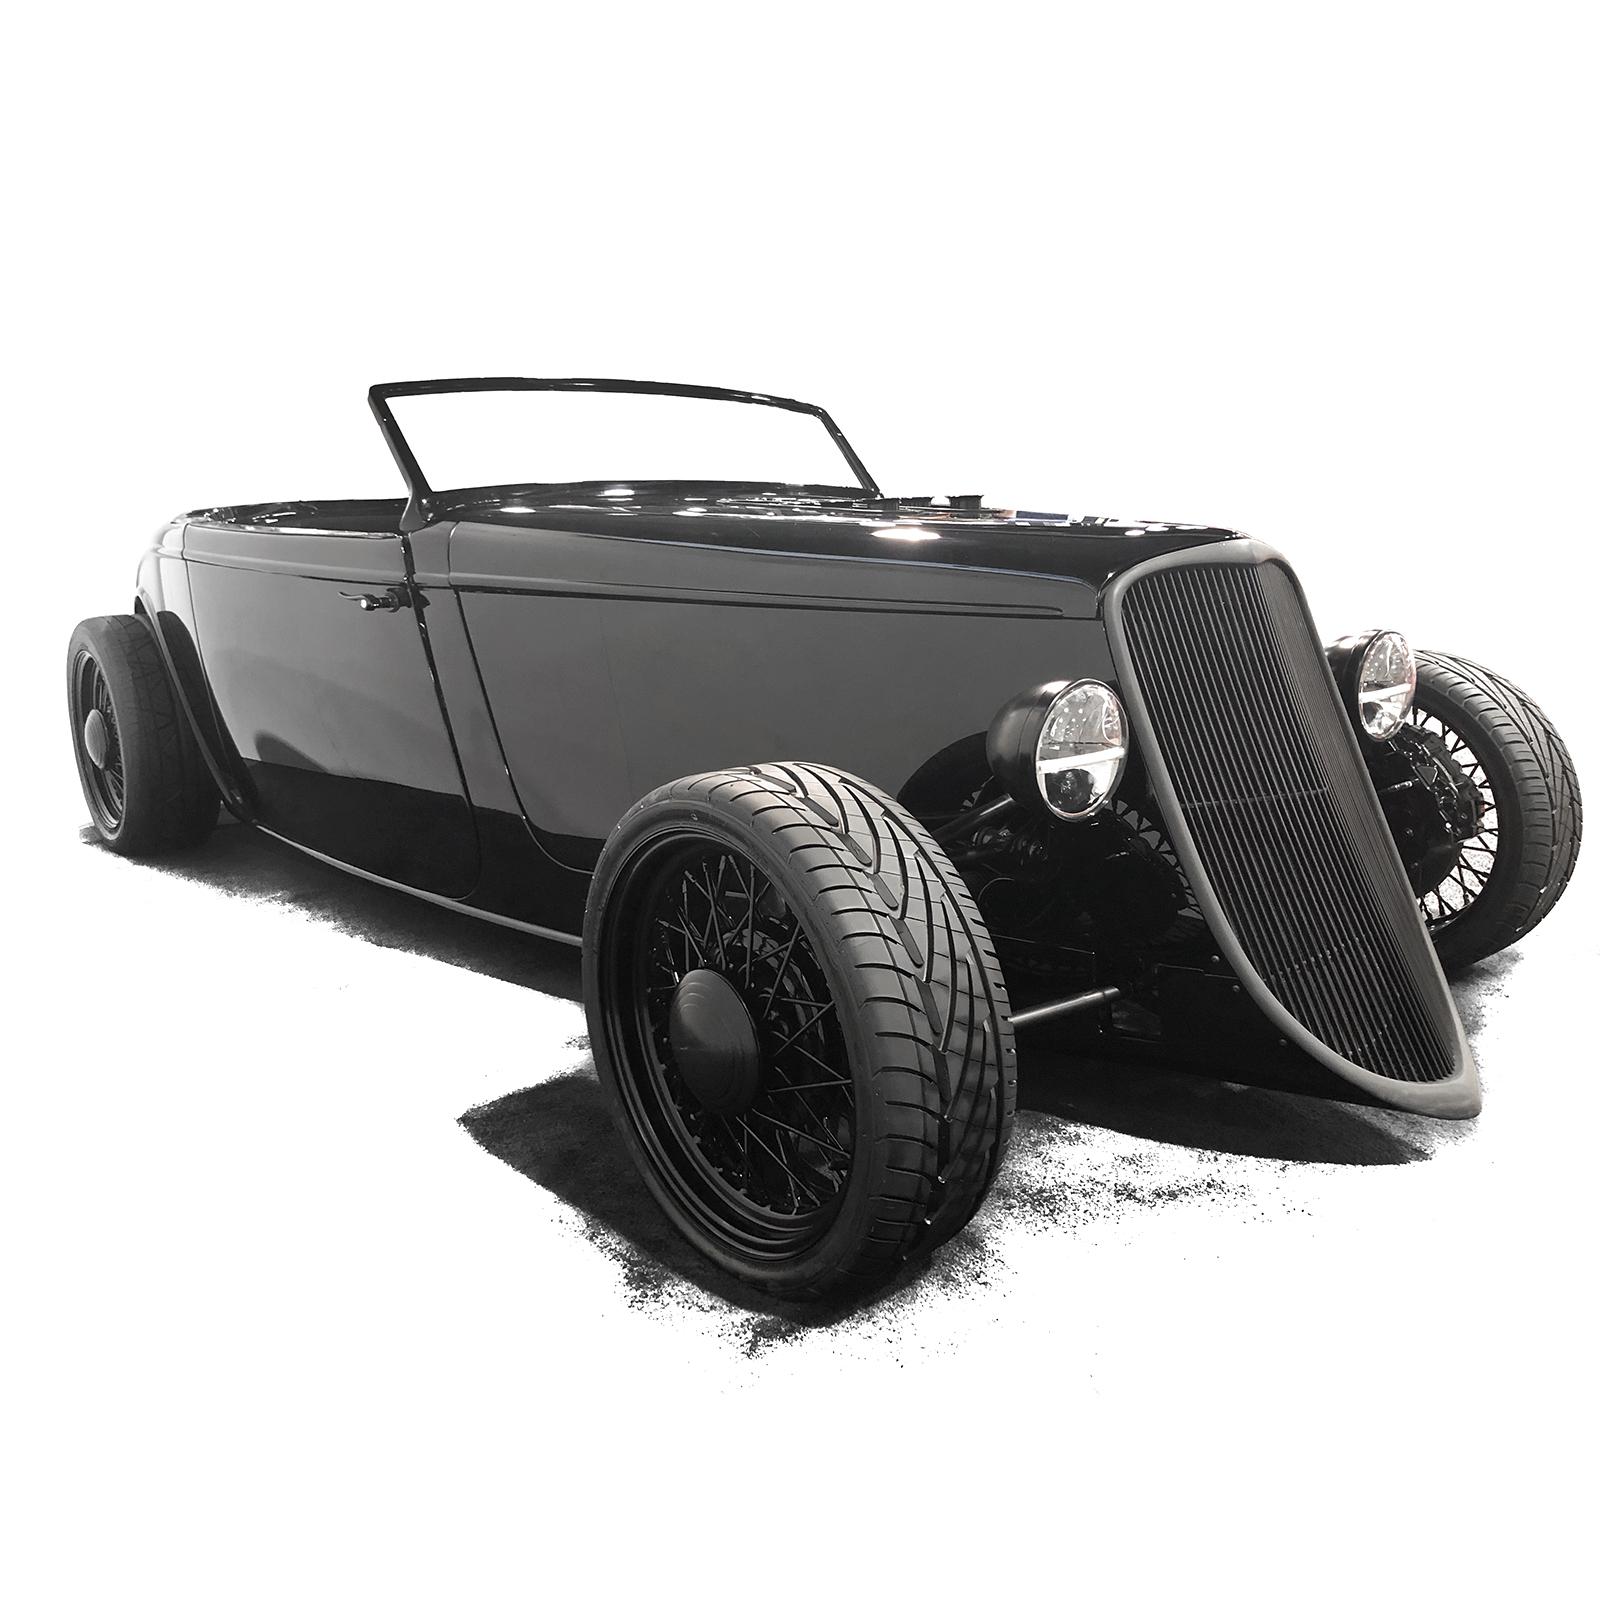 Speedmaster™ Blackbetty® Ford 33 Coupe Complete Automobile